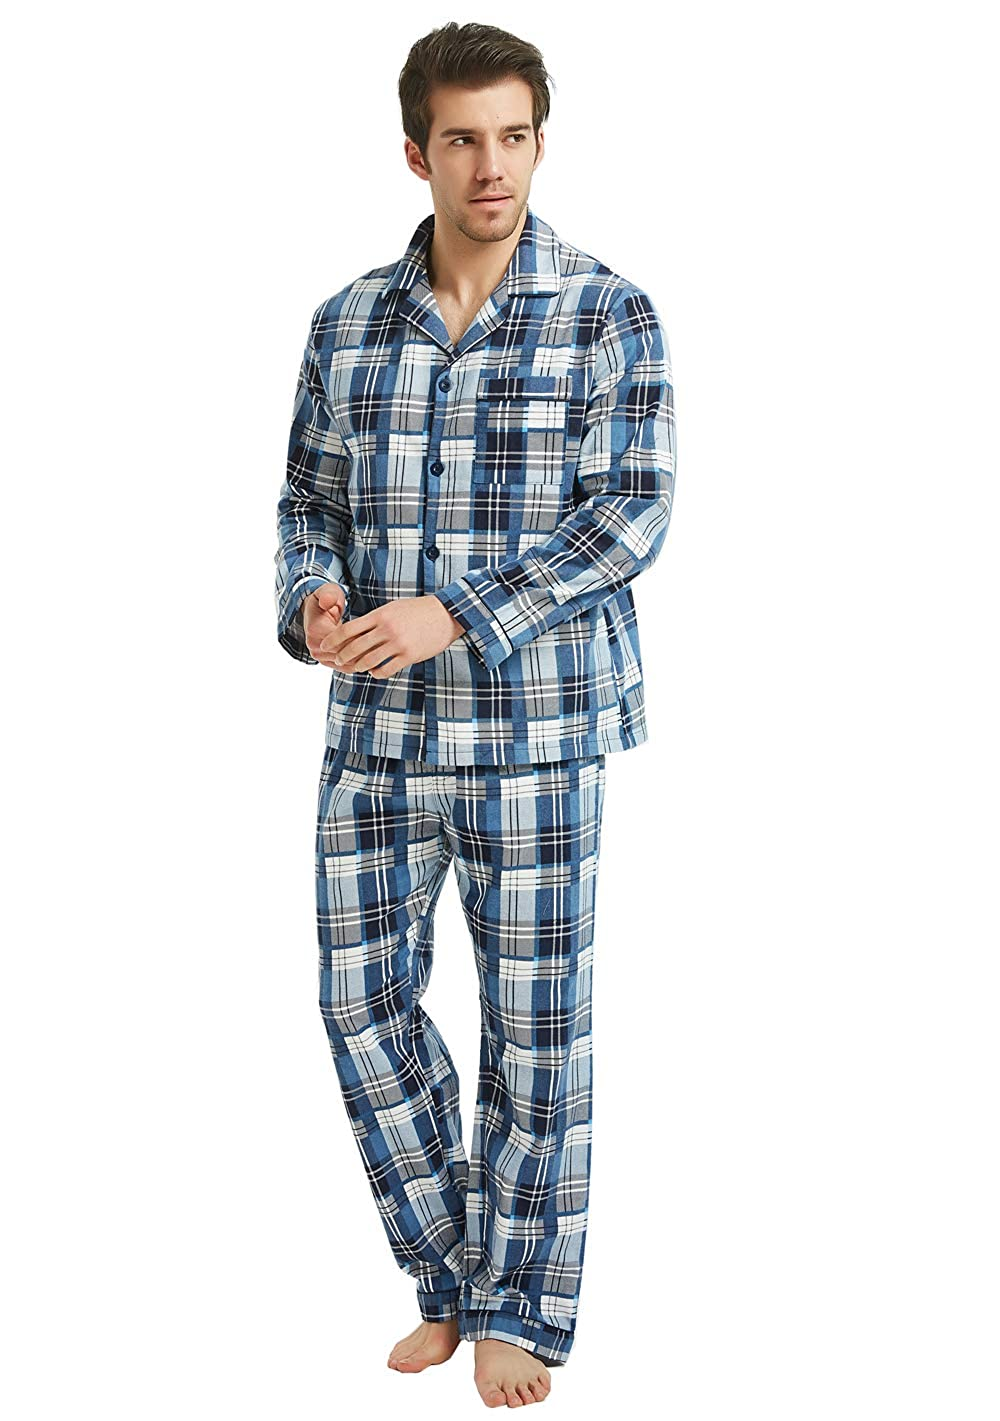 2-Piece Warm Pj Set GLOBAL Mens Flannel Pajamas